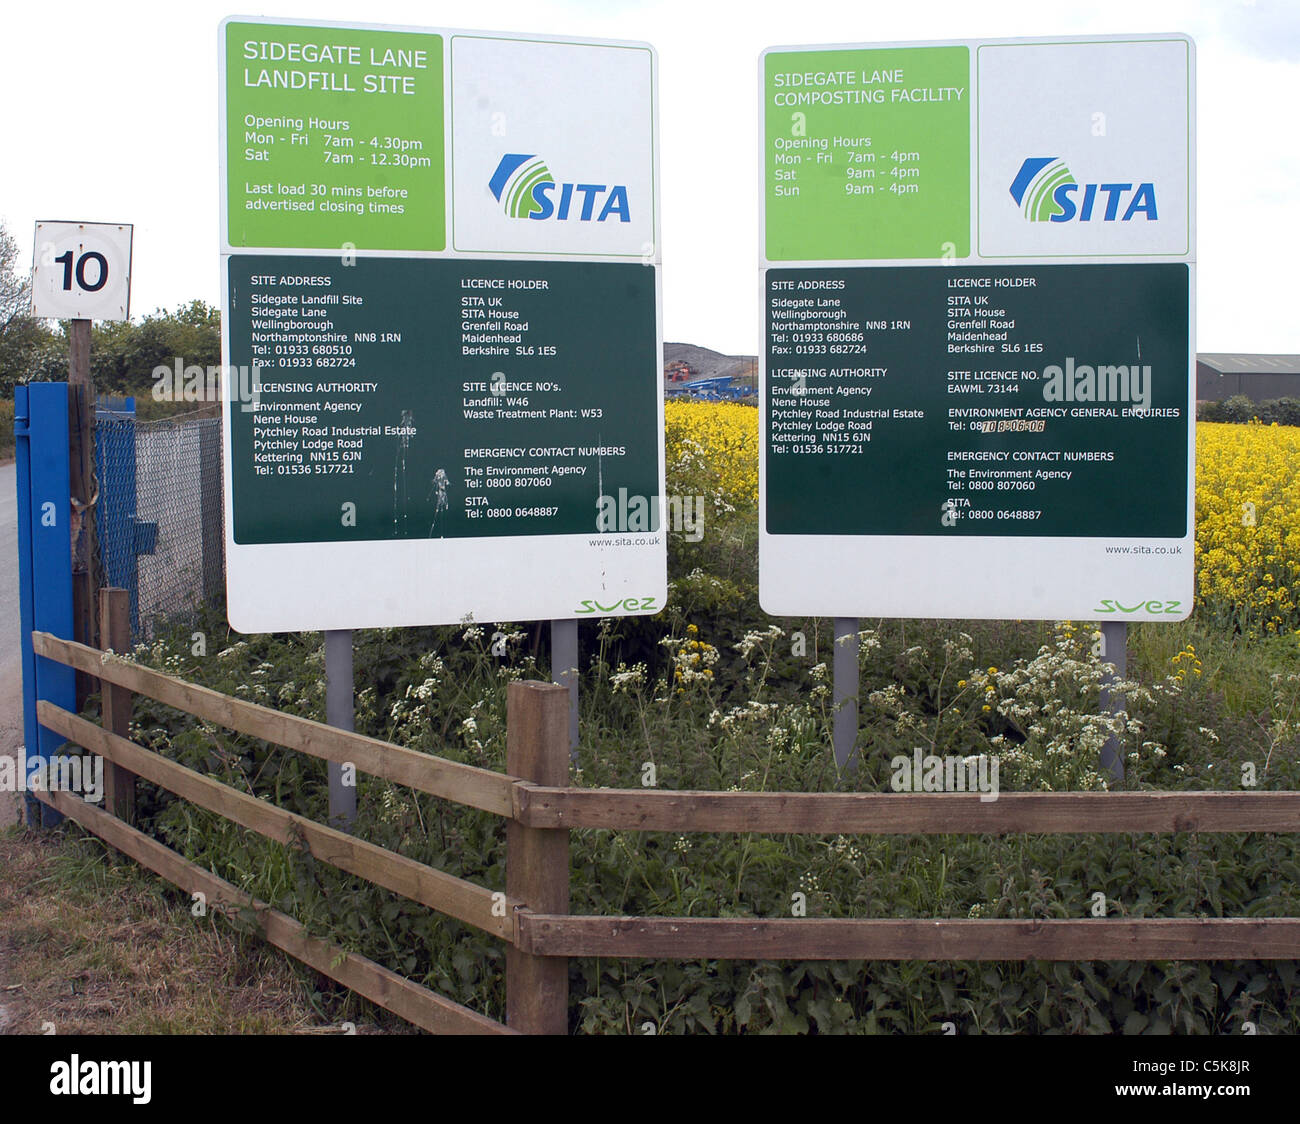 SITA UK landfill site, Sidegate Lane, Wellingborough, Northamptonshire - Stock Image